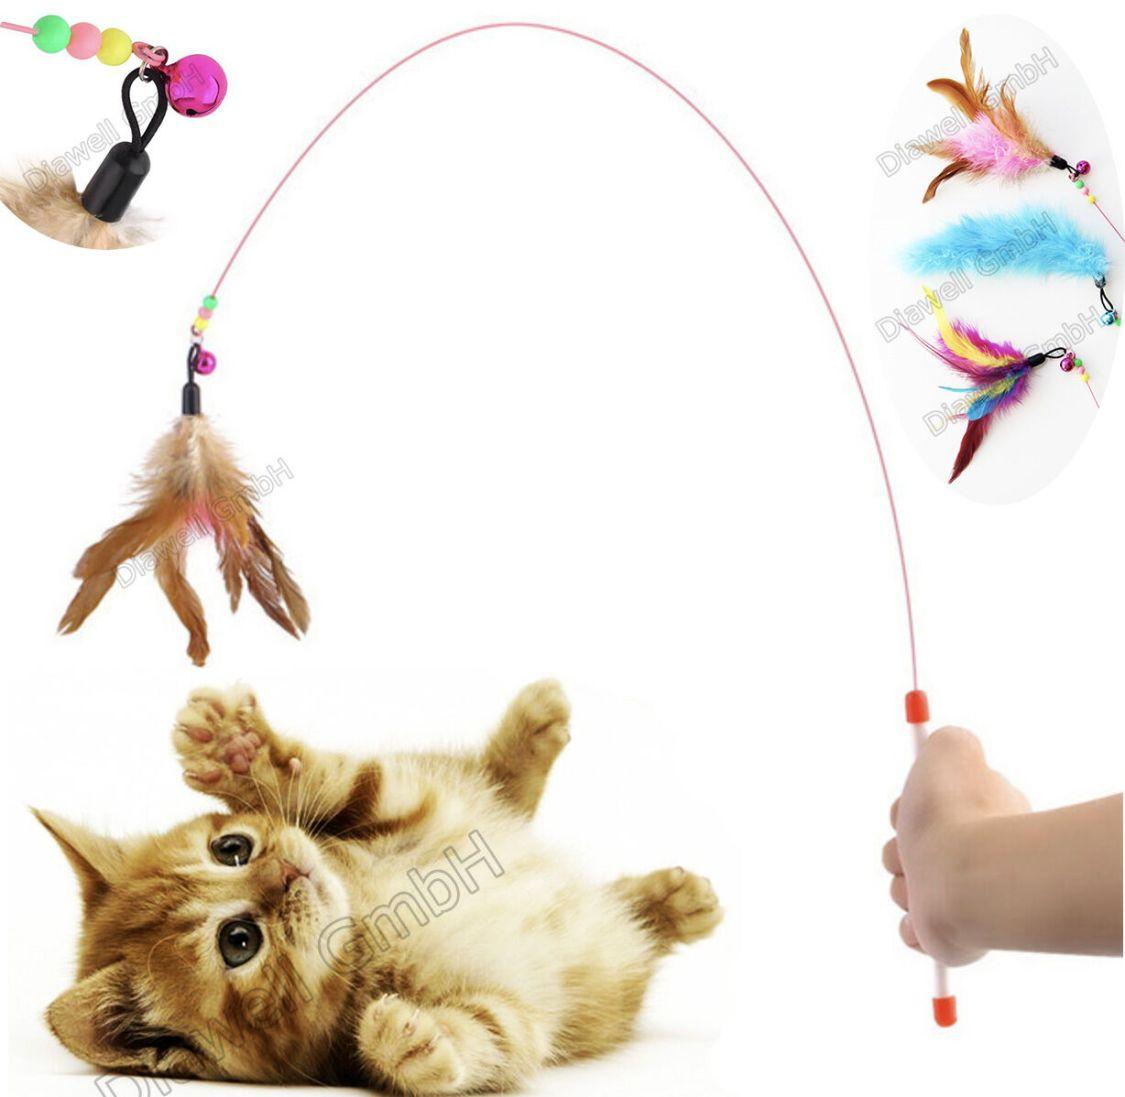 Katzenangel Angel Spielangel für Katzen Katzenspielzeug Katze Spielzeug